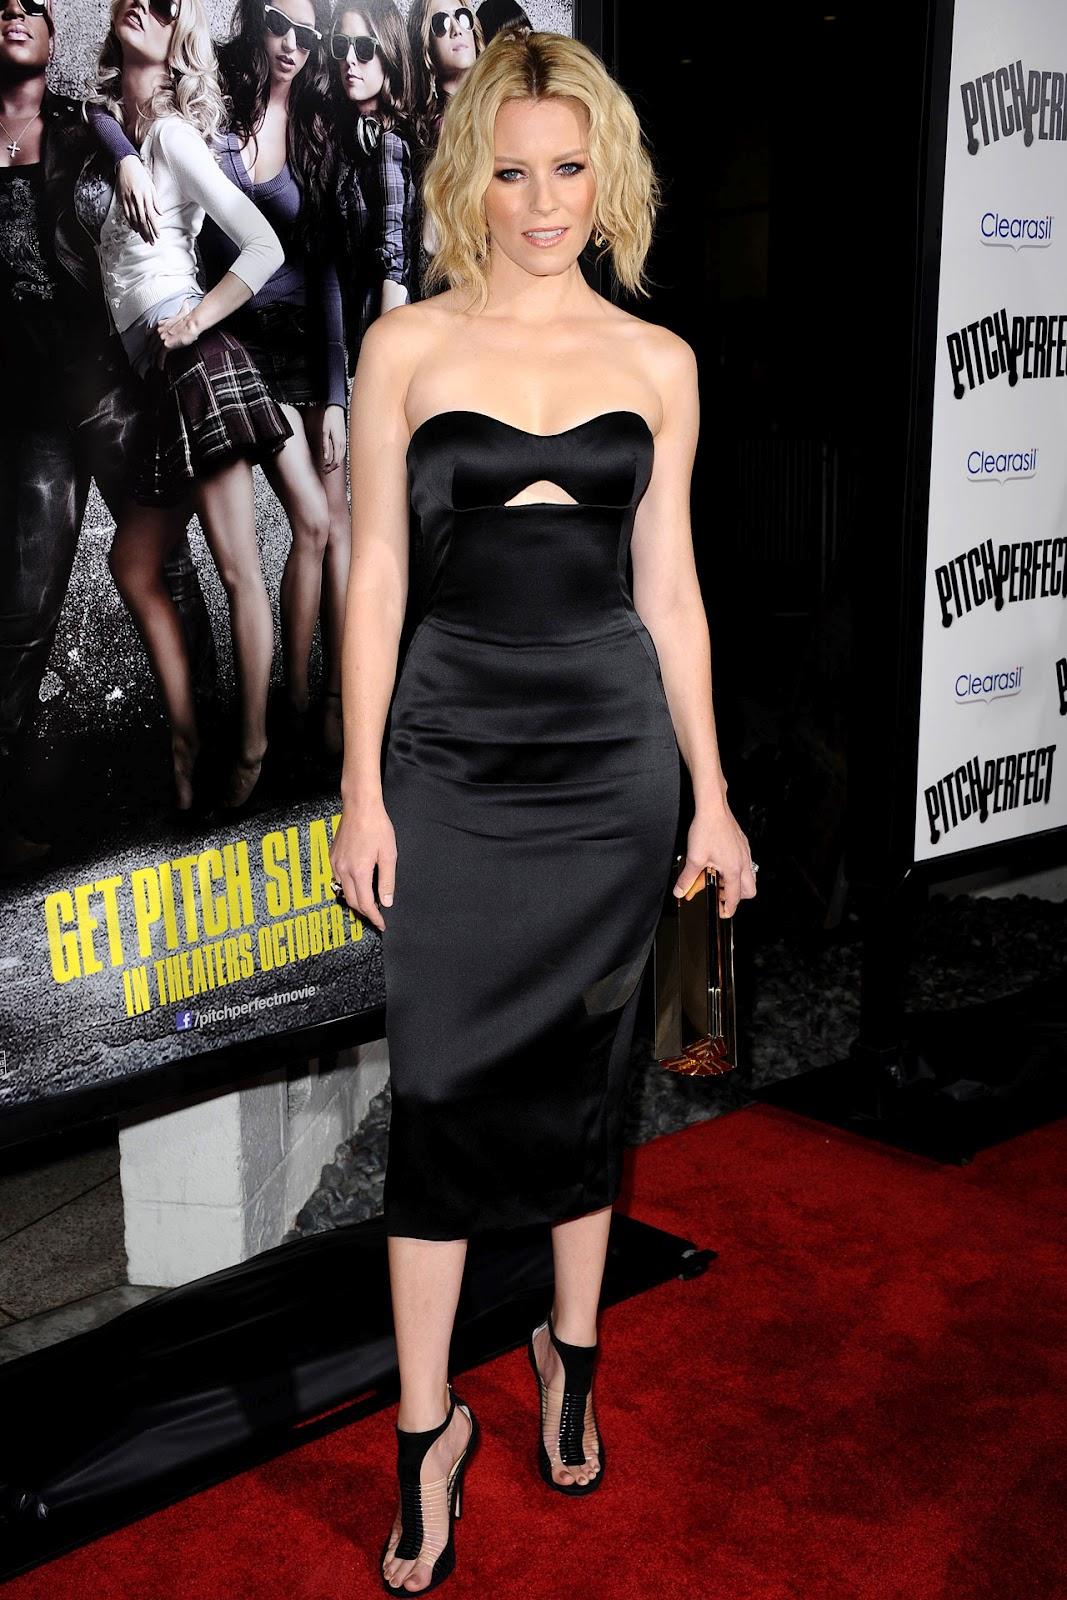 Elizabeth Banks Wearing Black Satin Strapless Dress